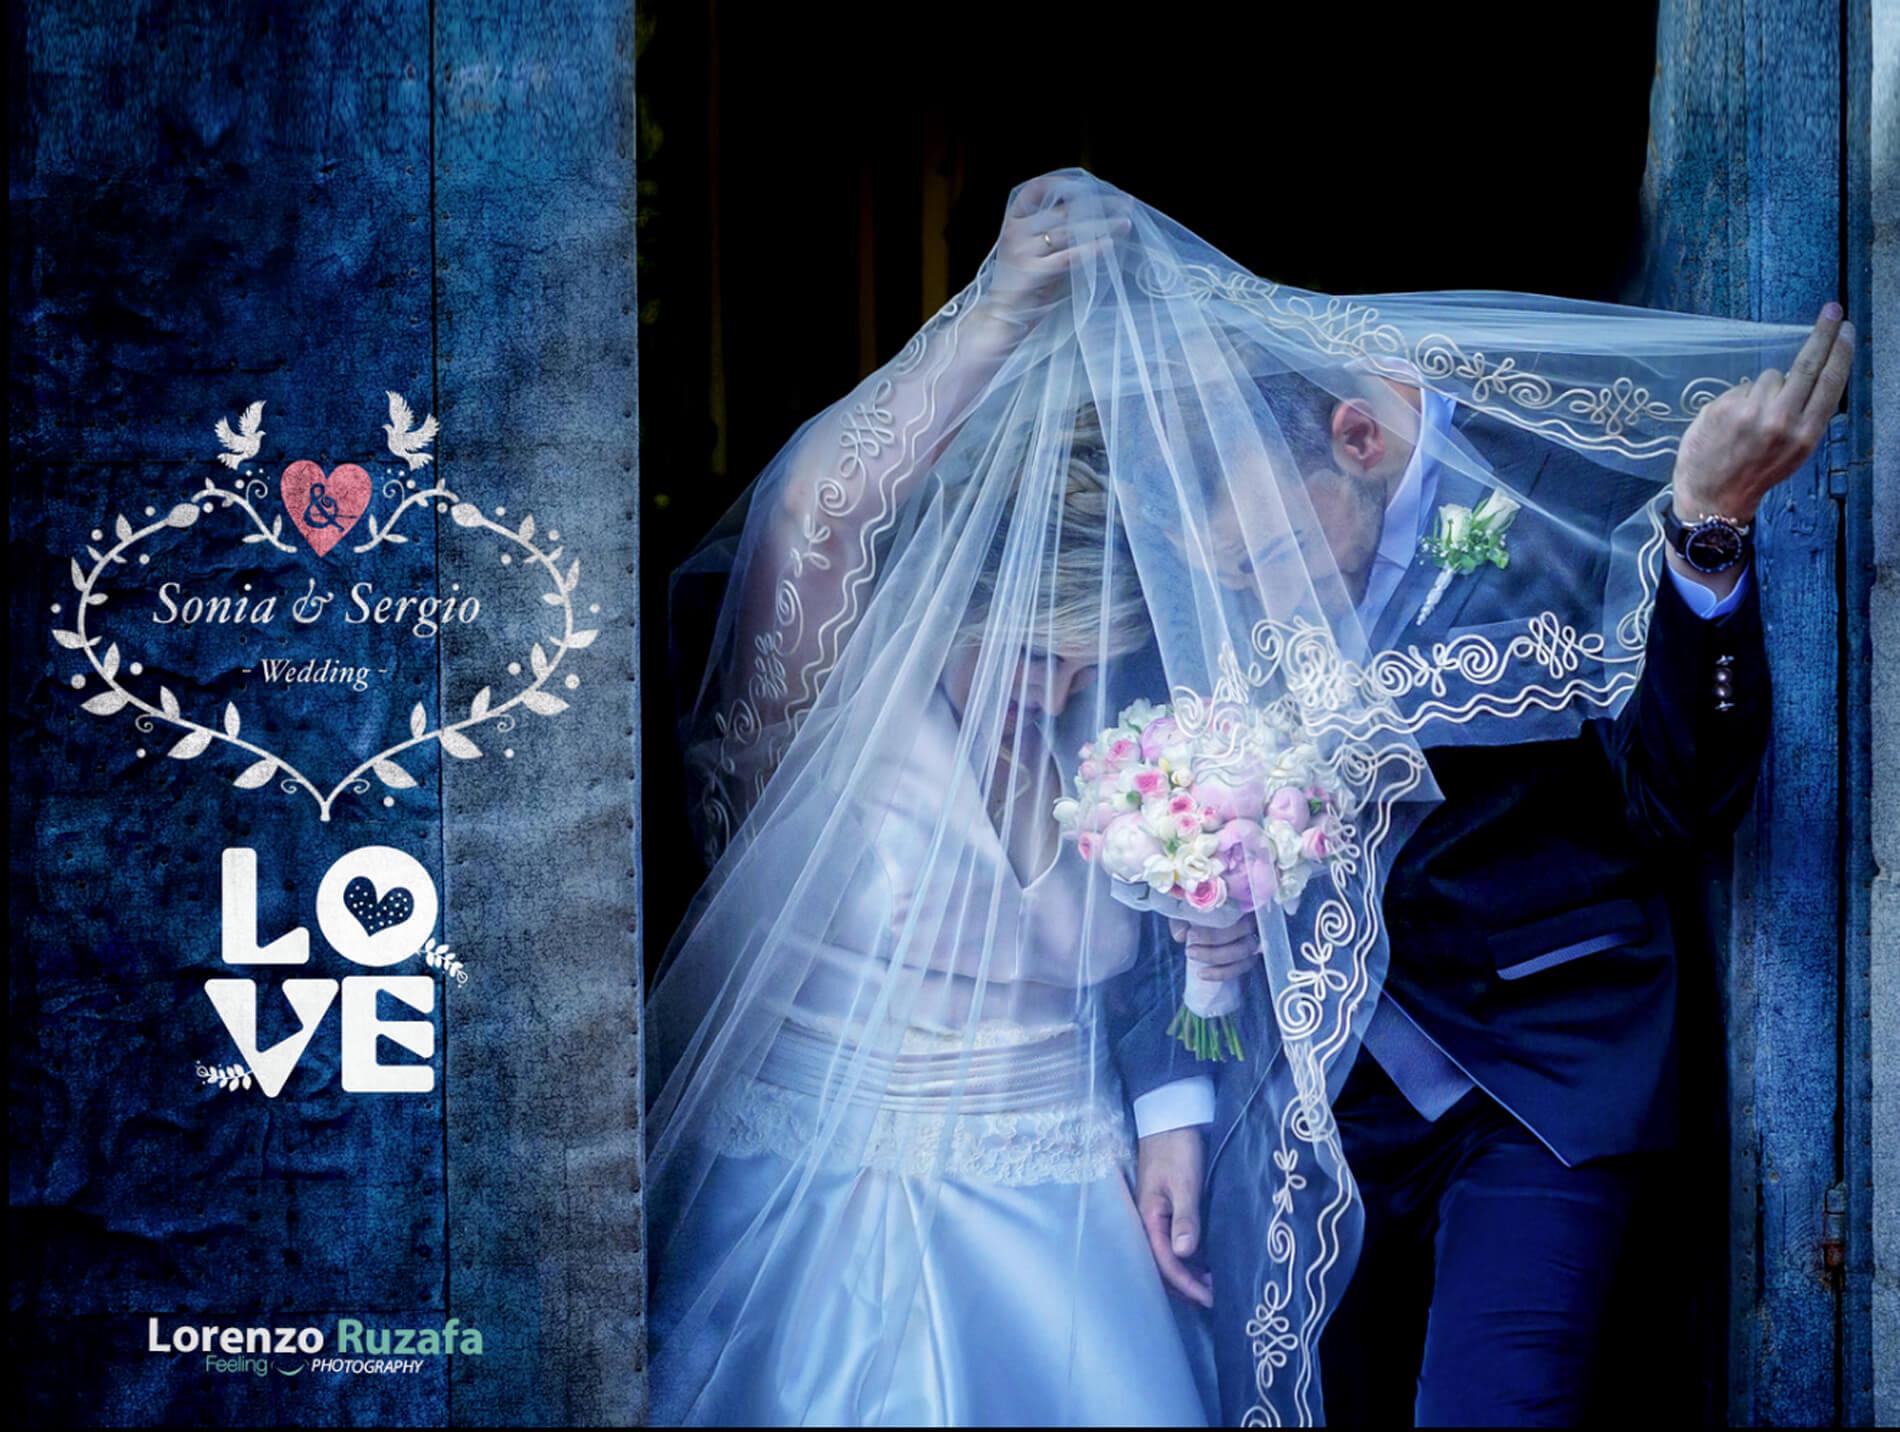 Web de Lorenzo Ruzafa. Fotógrafo de bodas en Castellón